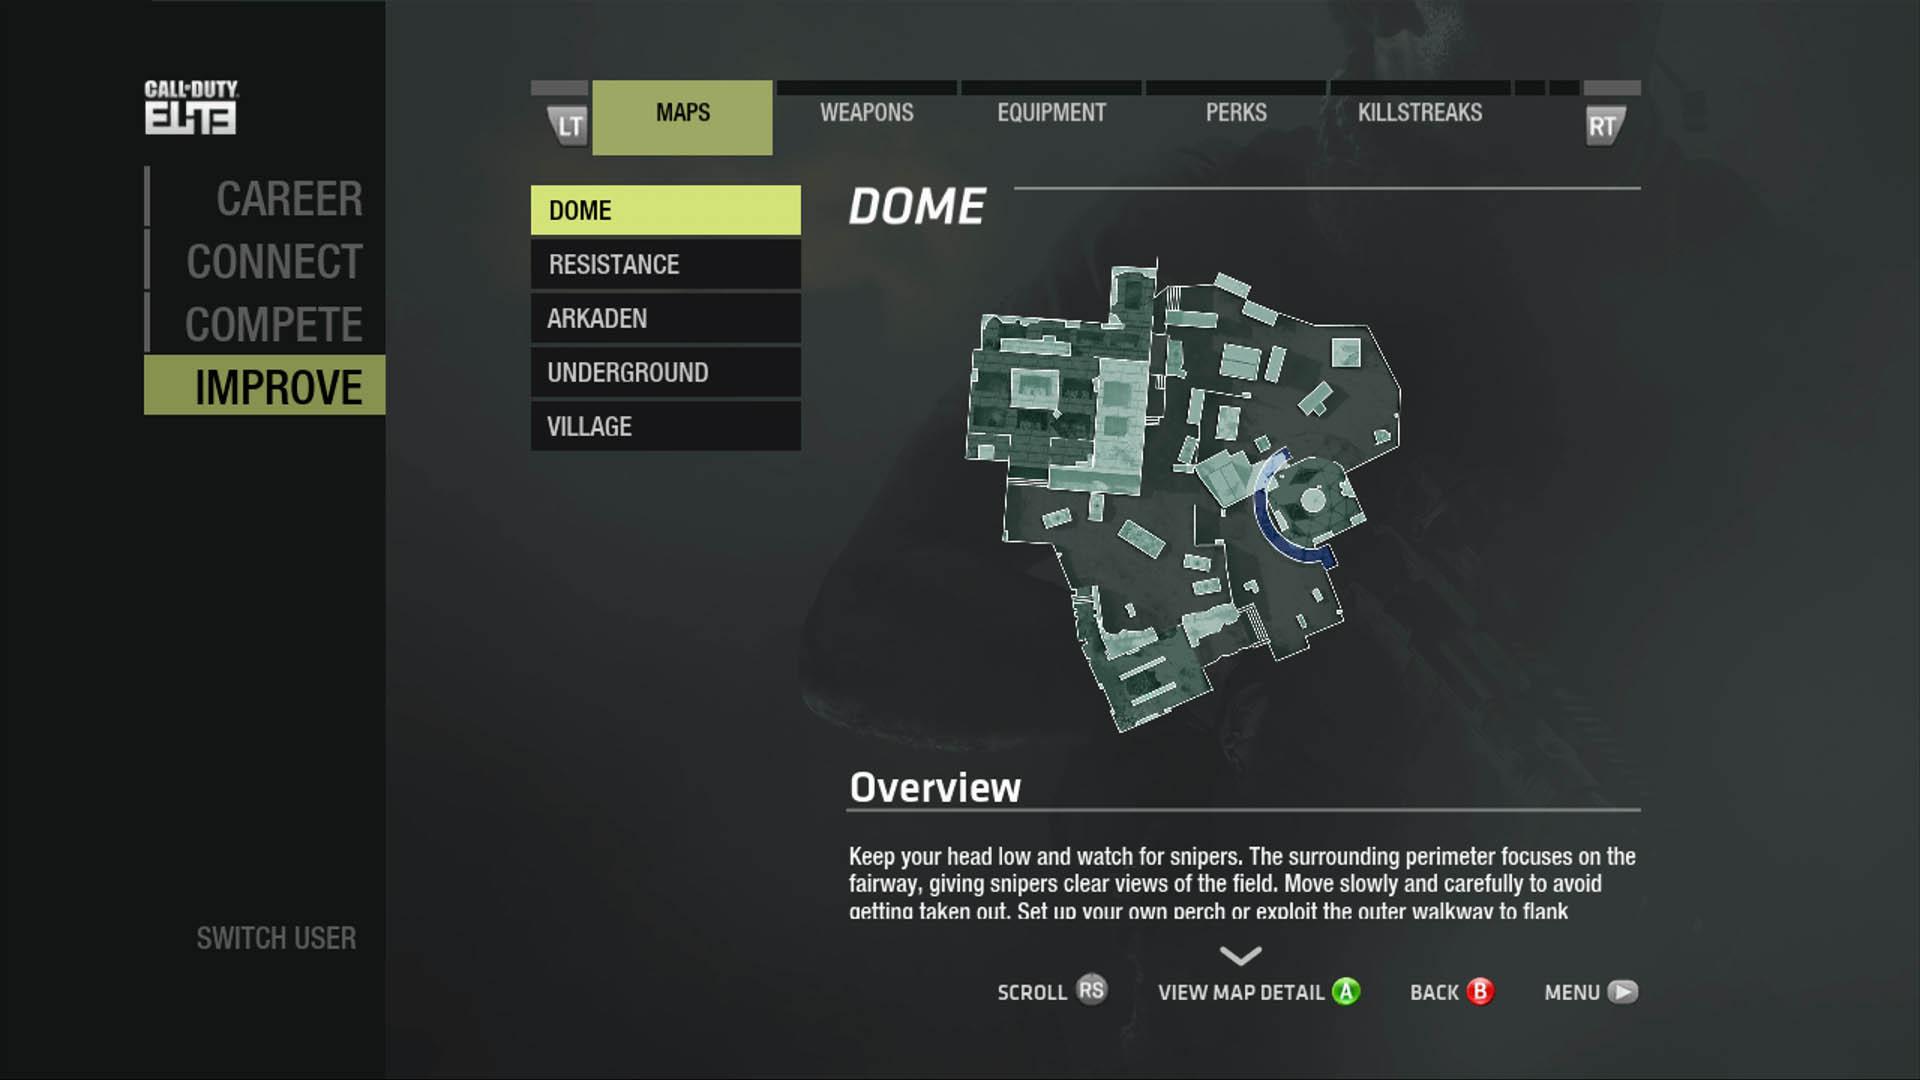 Call of Duty Elite láká v novém videu 50859